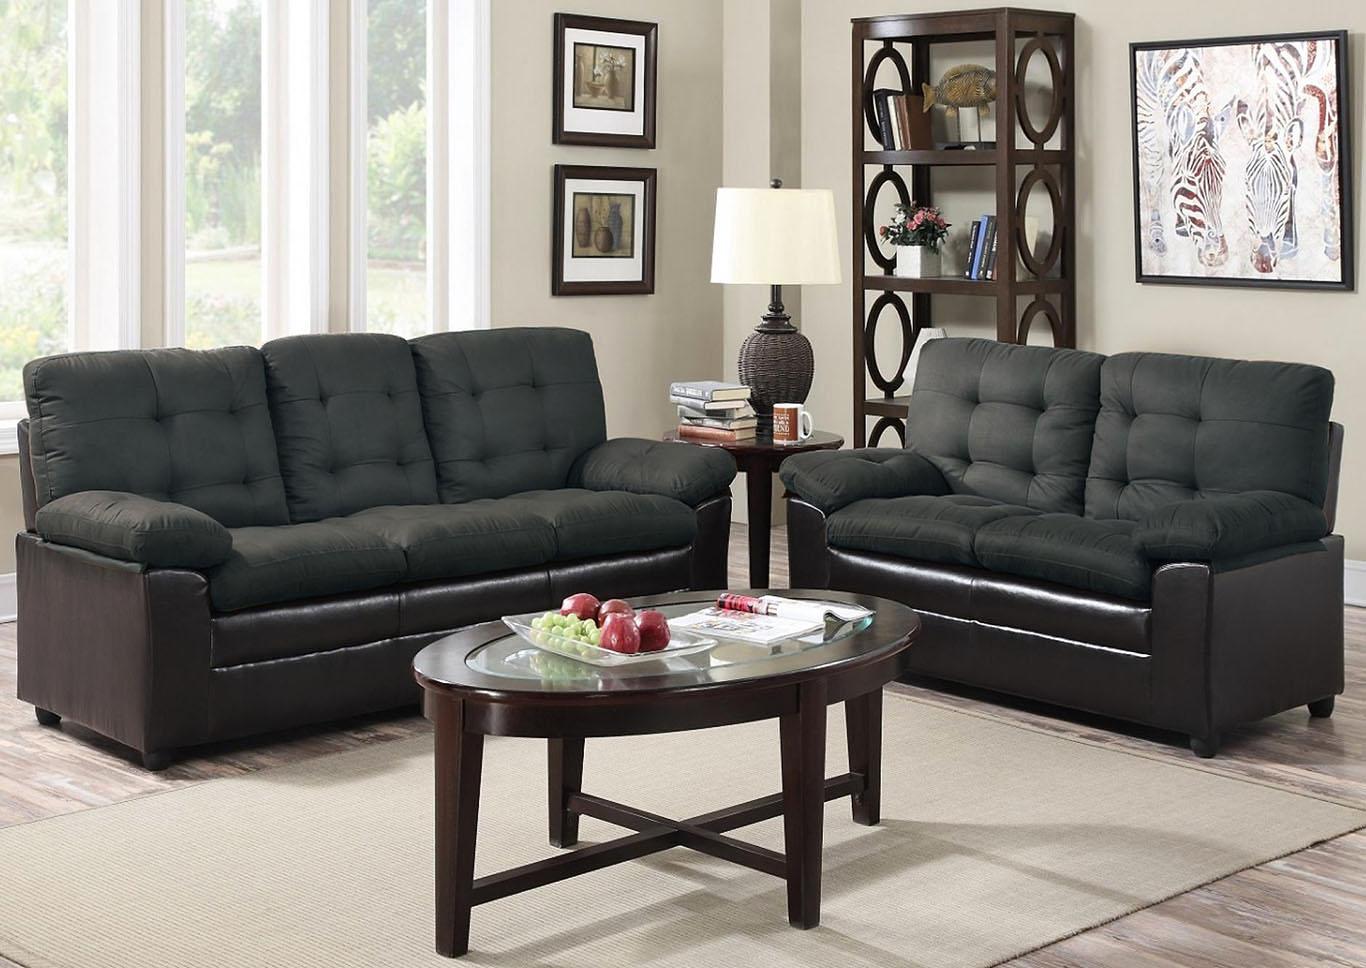 Grey Microfiber Sofa And Loveseat,Global Trading